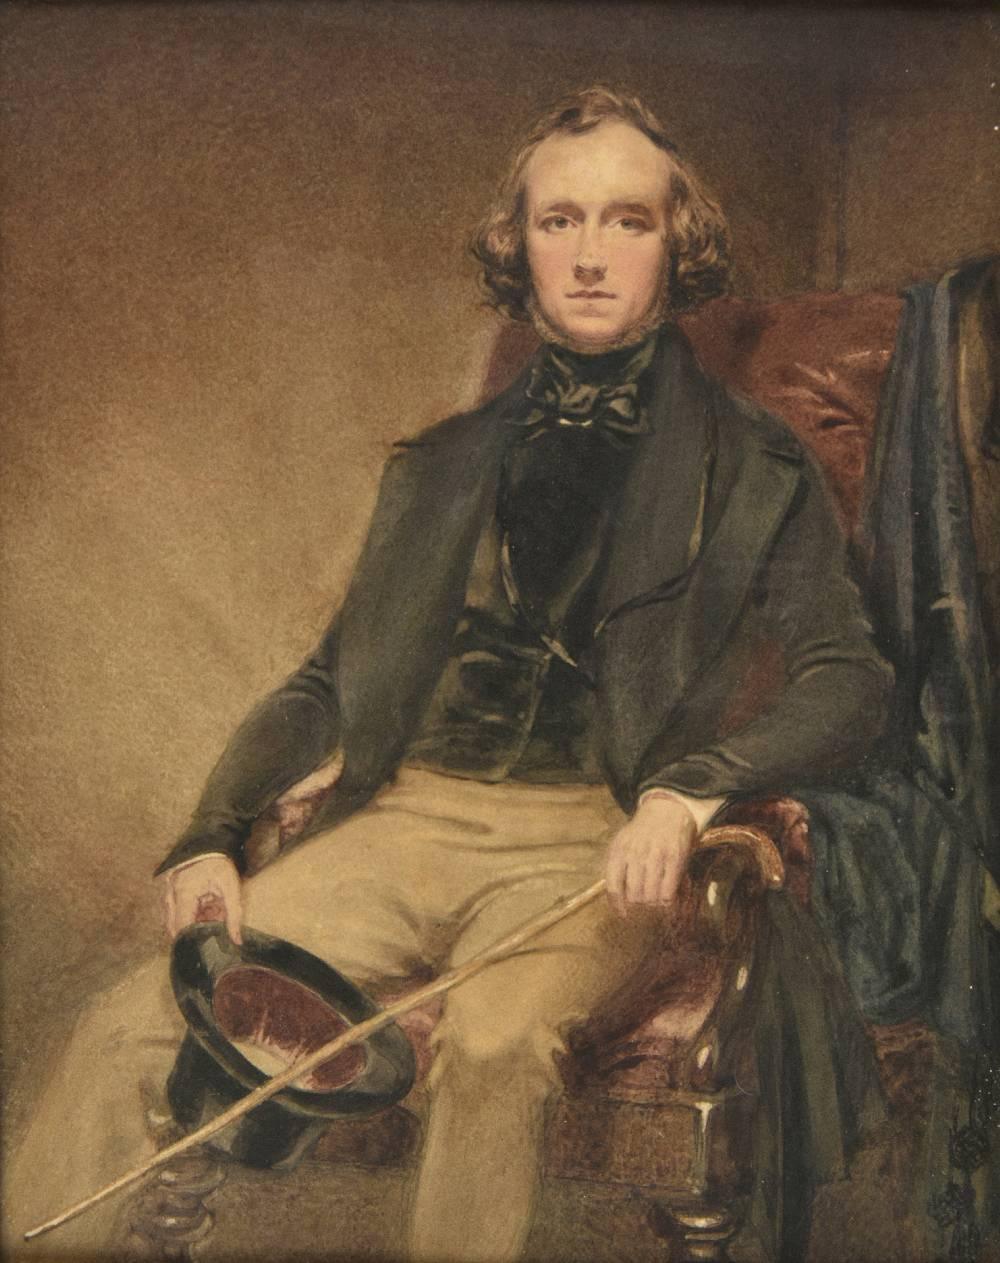 Lot 44 - *Maclise (Daniel, 1806-1870). Self portrait, watercolour, unsigned, period bird's-eye maple wood